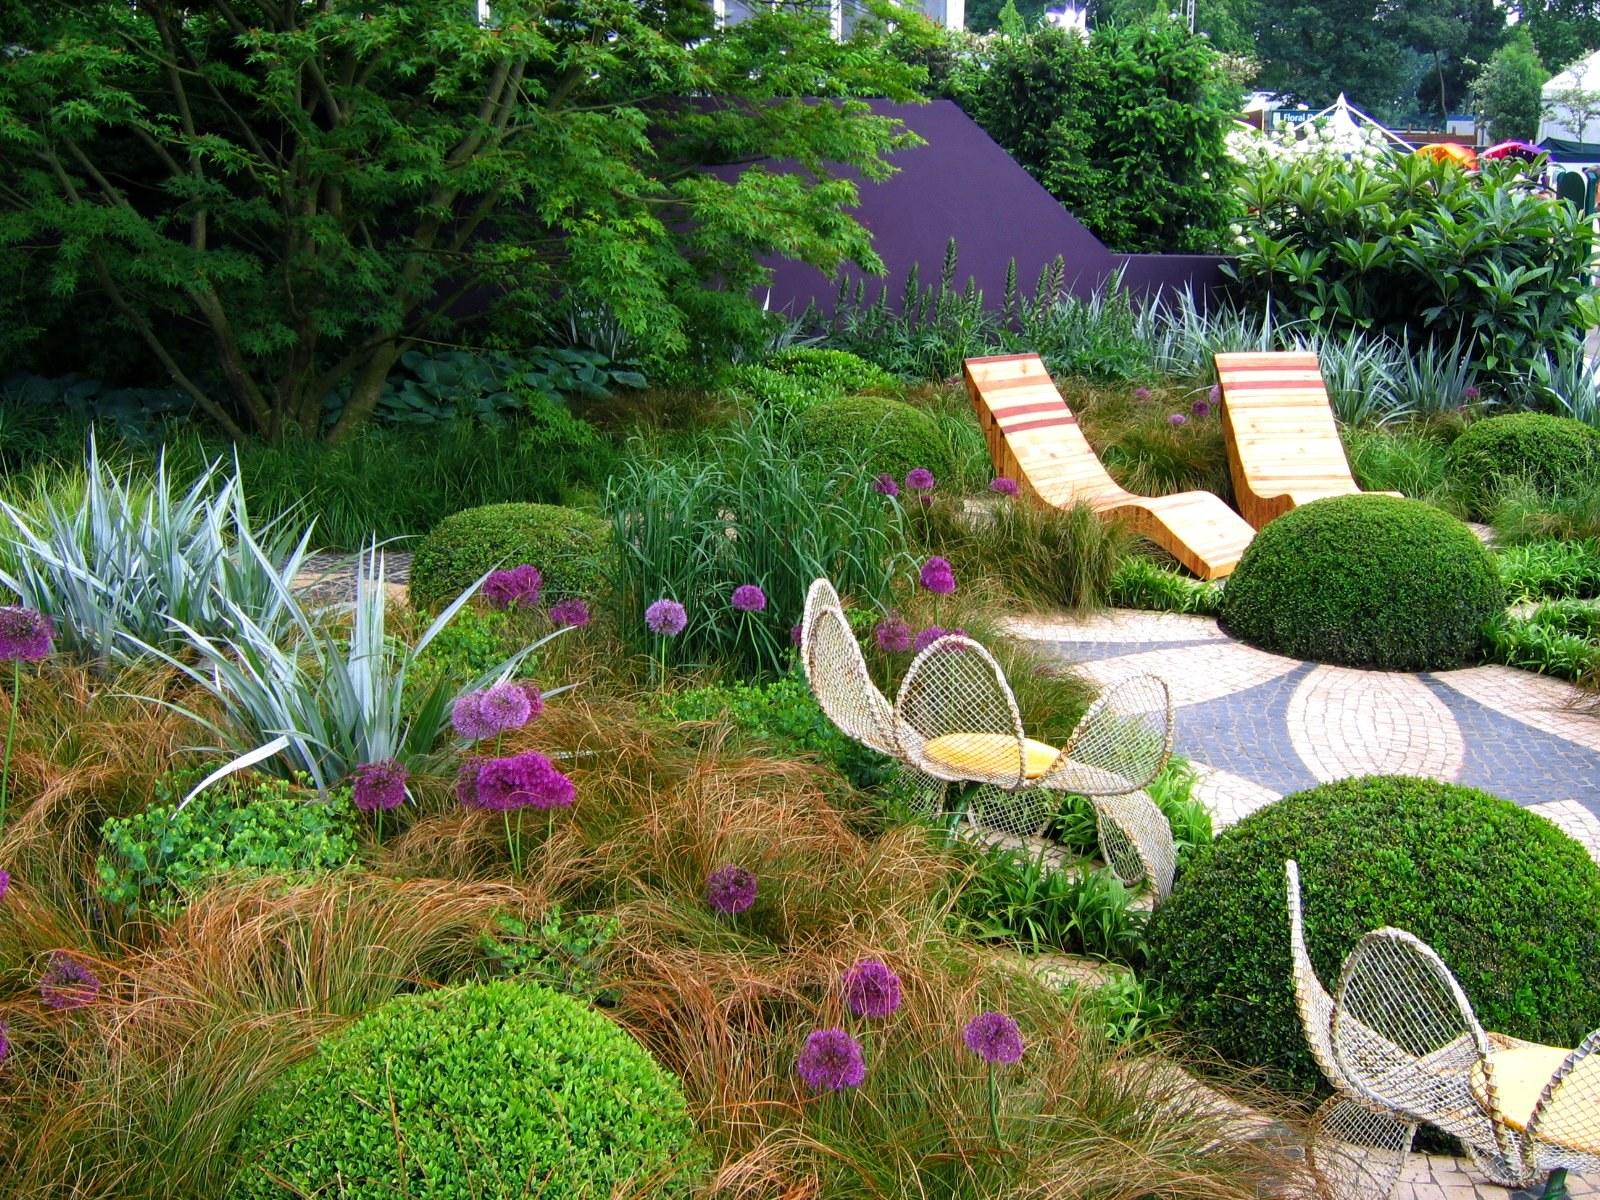 Beautiful nature sceneries pics beautiful nature scenery for Great garden designers